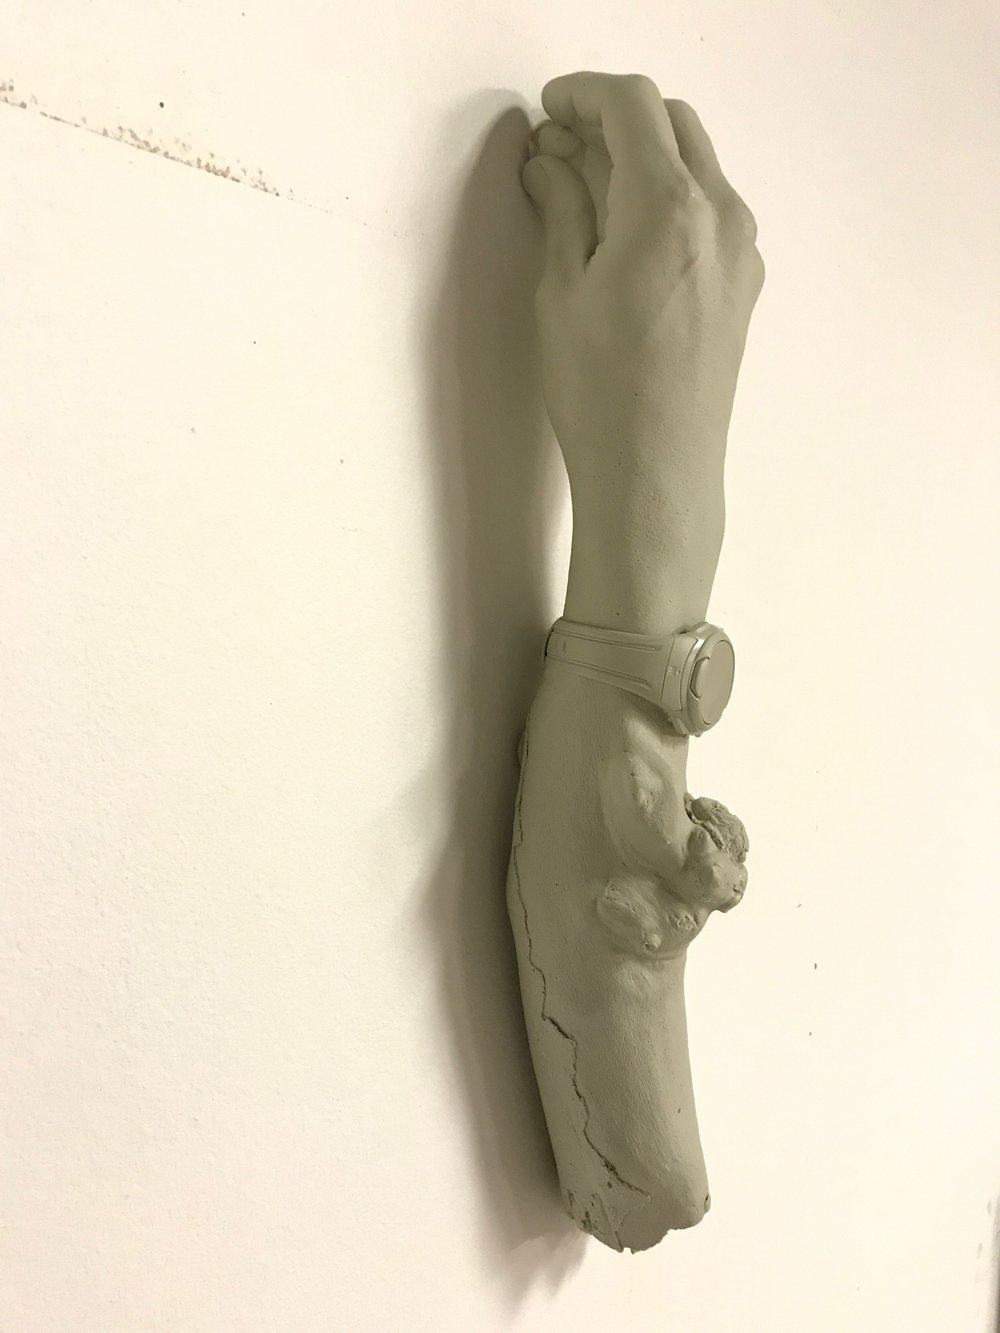 - Chris MahonskiCast Resin SculptureEdition 1/5